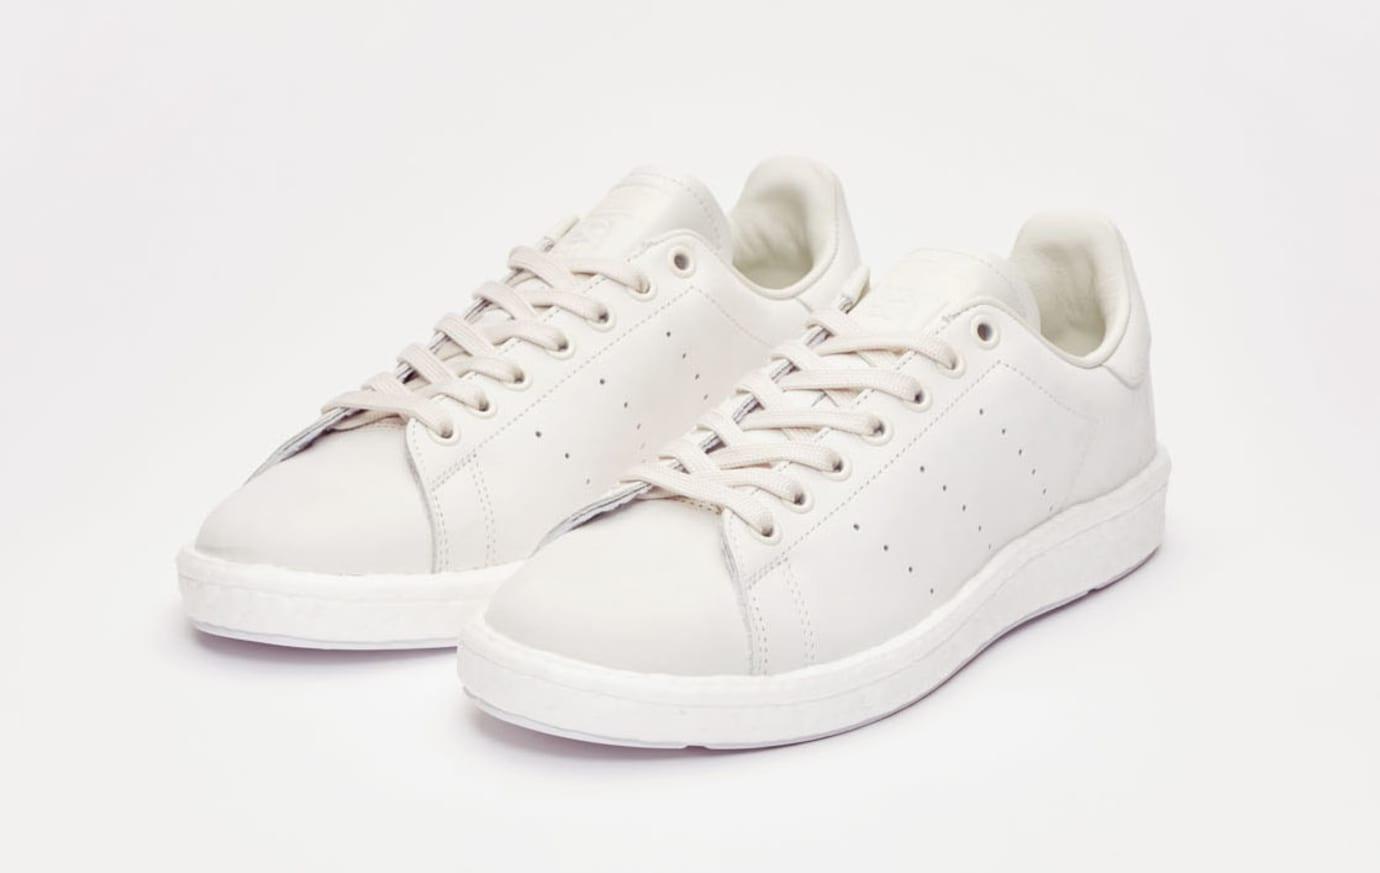 SNS Adidas Shades of White 5